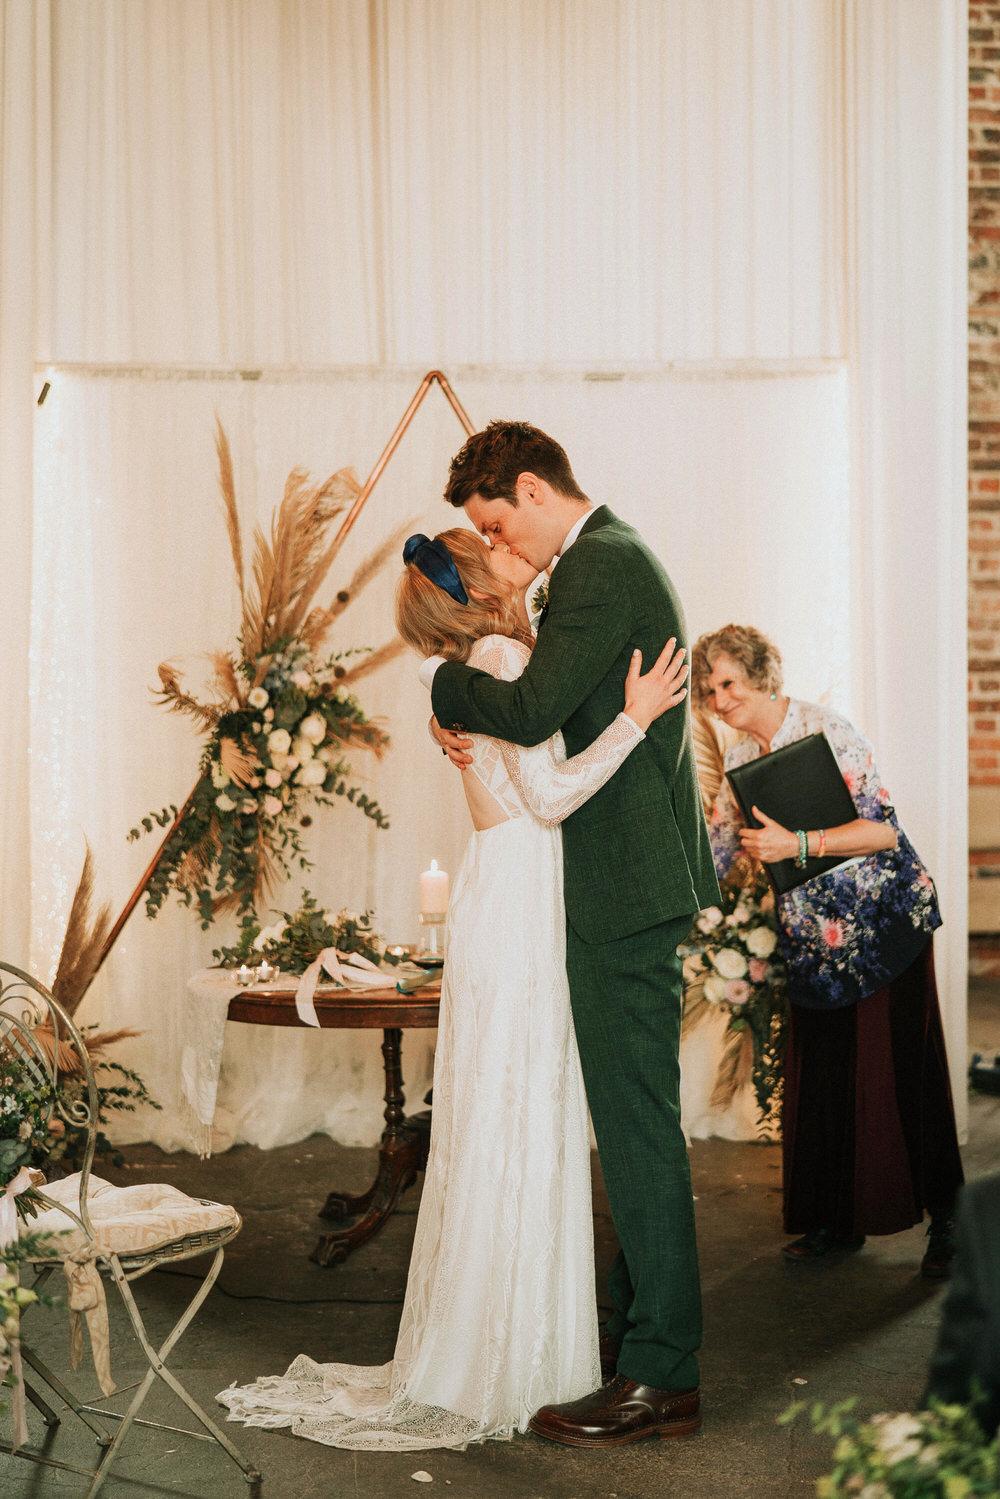 The-Millhouse-wedding-photos-0072 72